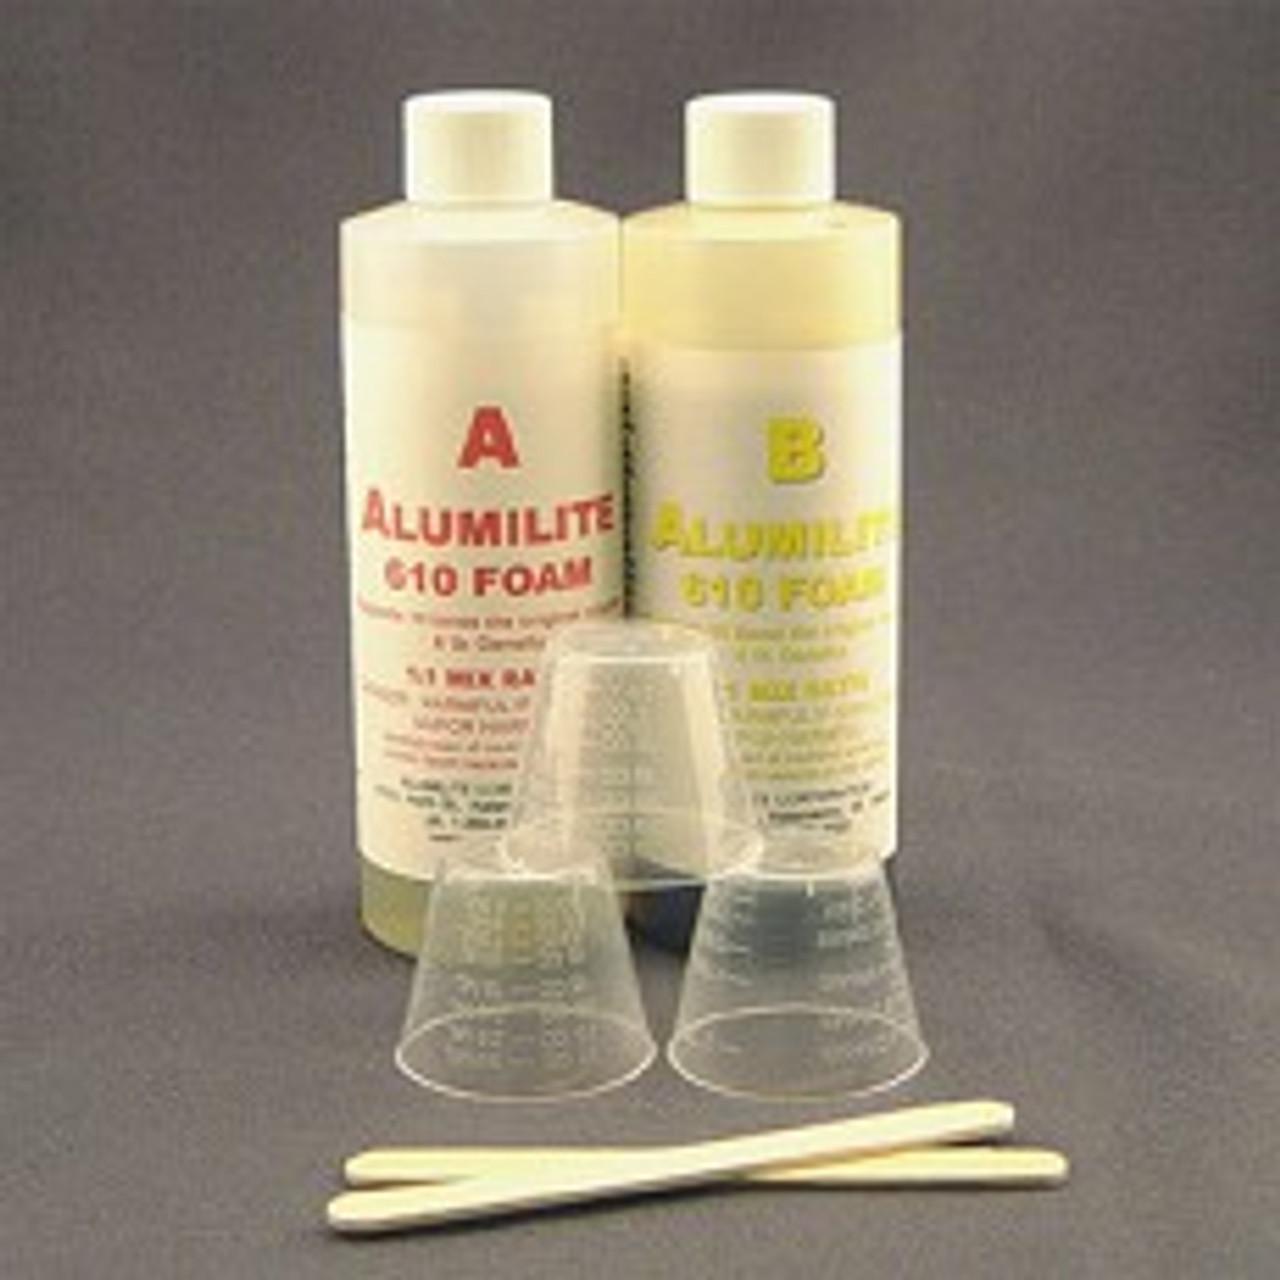 Alumilite Super Foam 320 16 oz